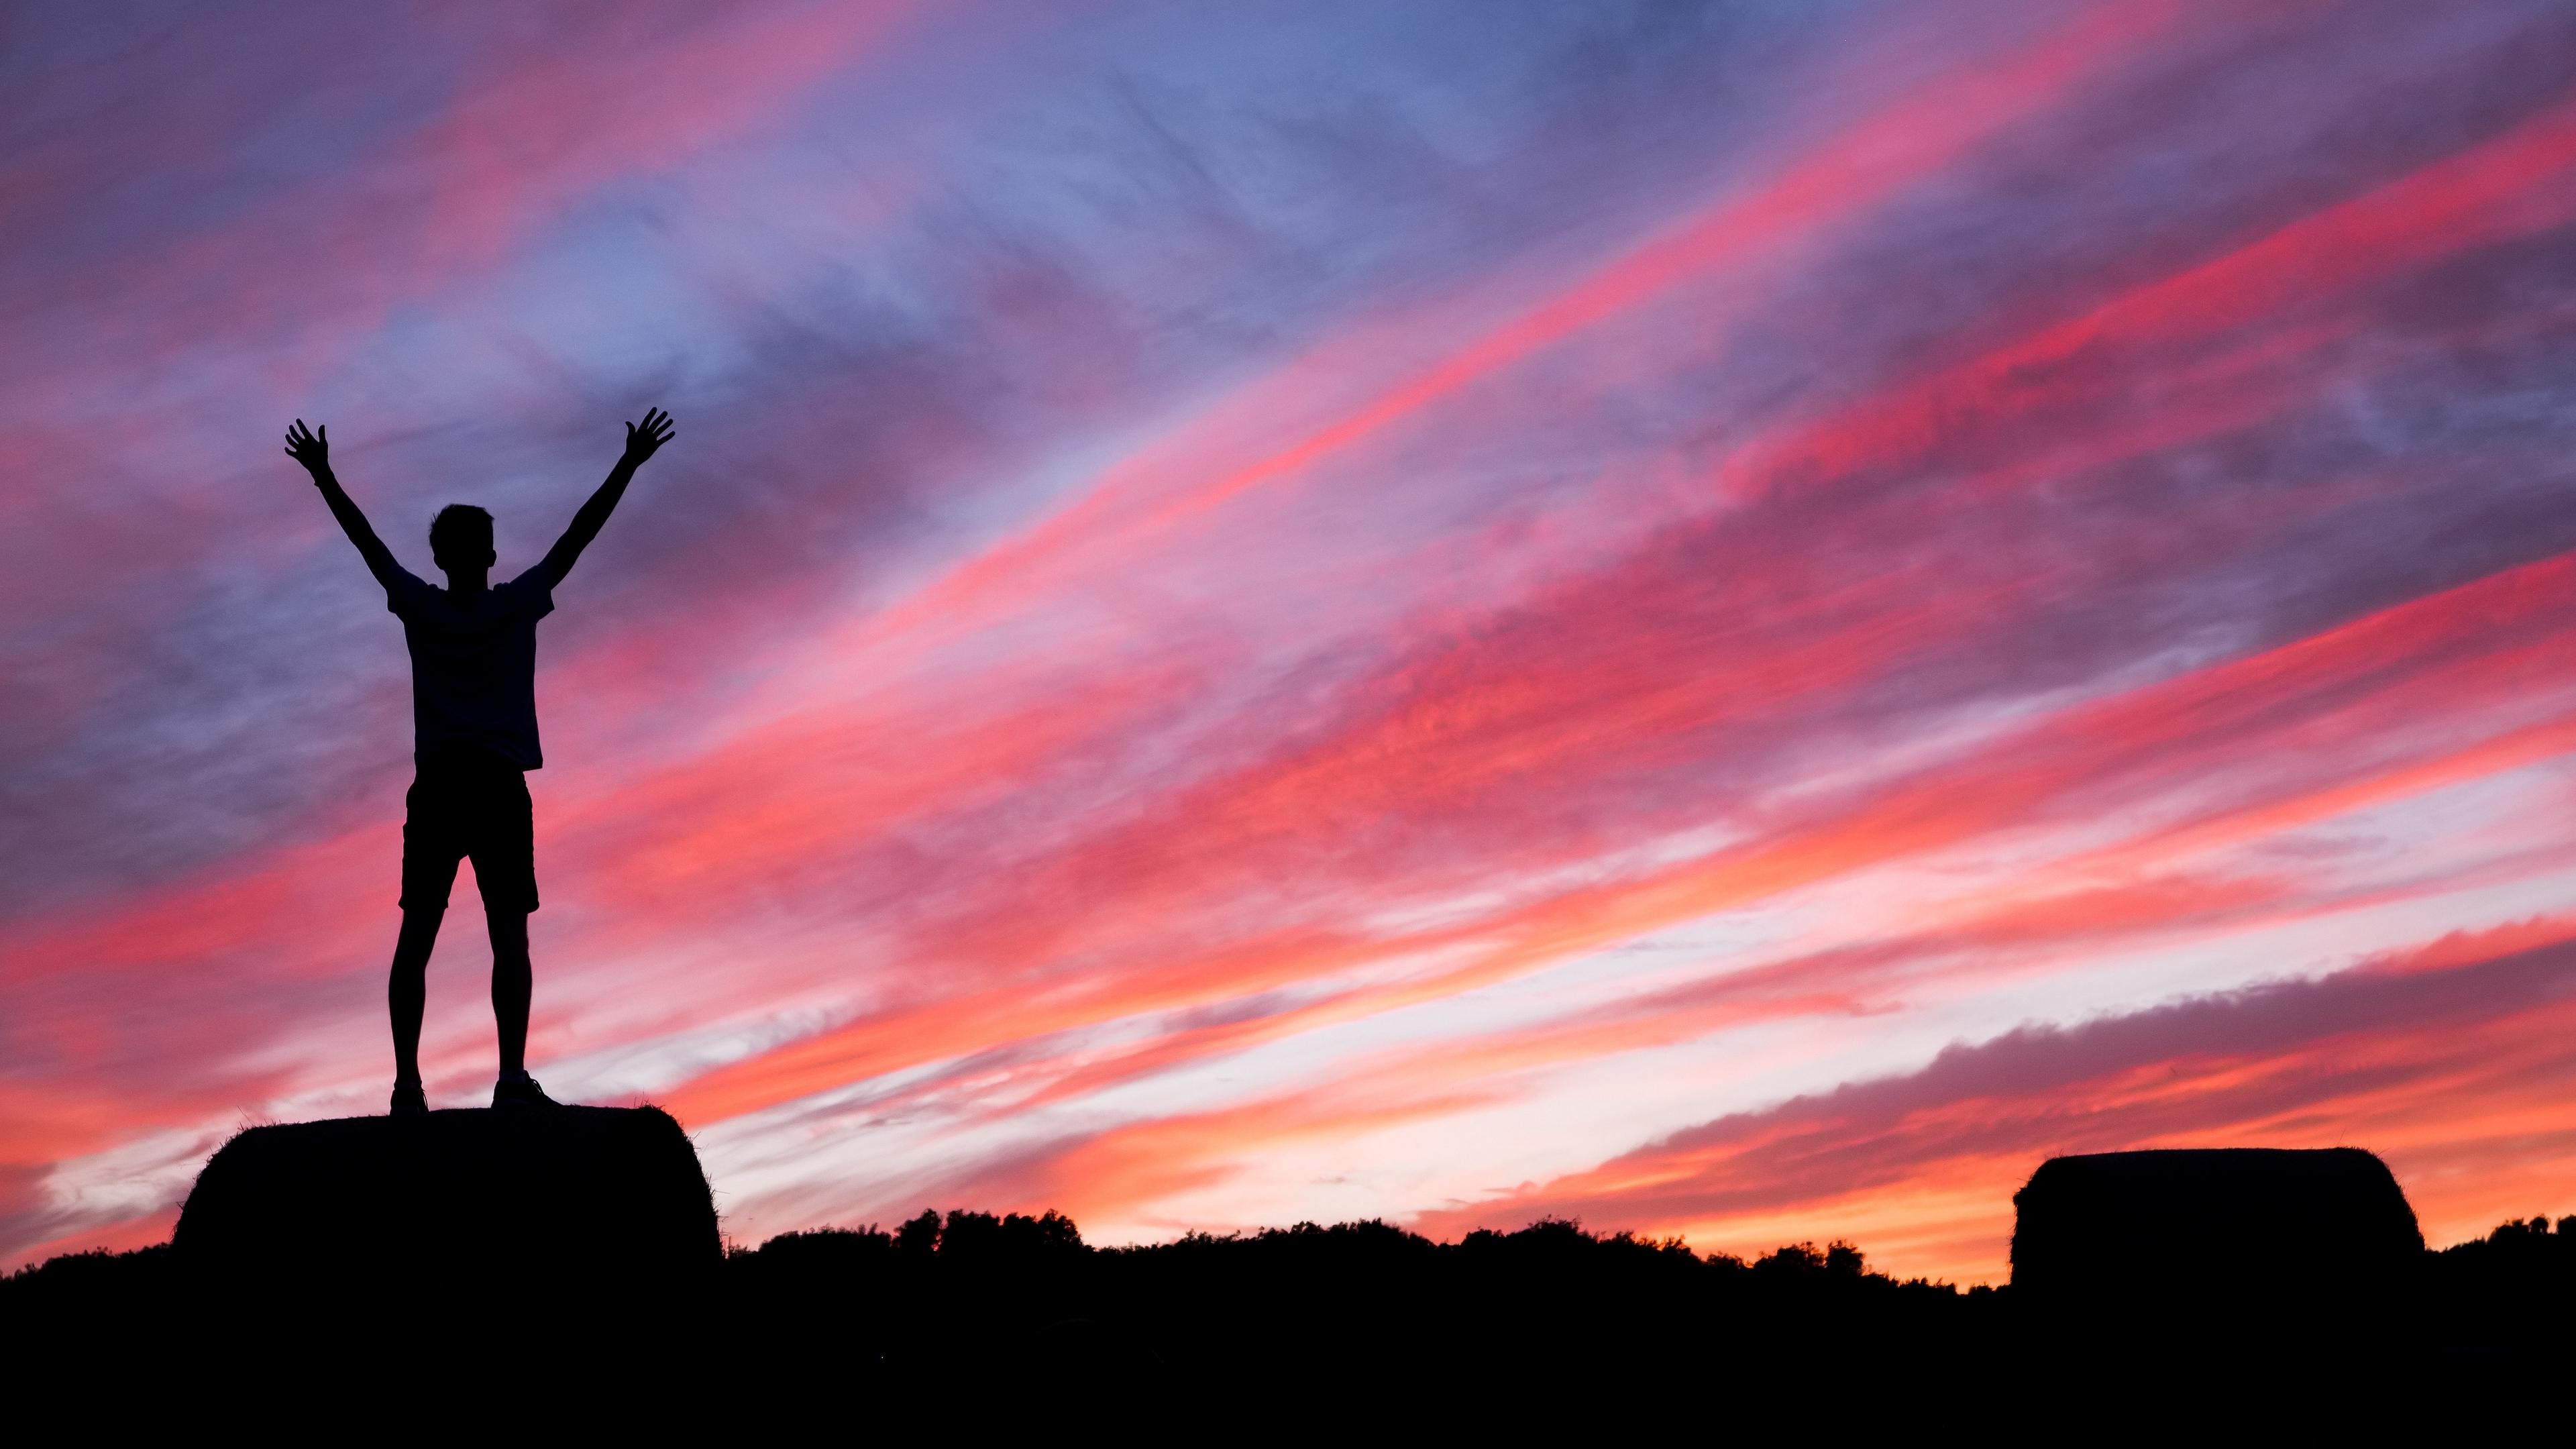 silhouette man hill sunset 4k 1540574482 - silhouette, man, hill, sunset 4k - Silhouette, Man, hill